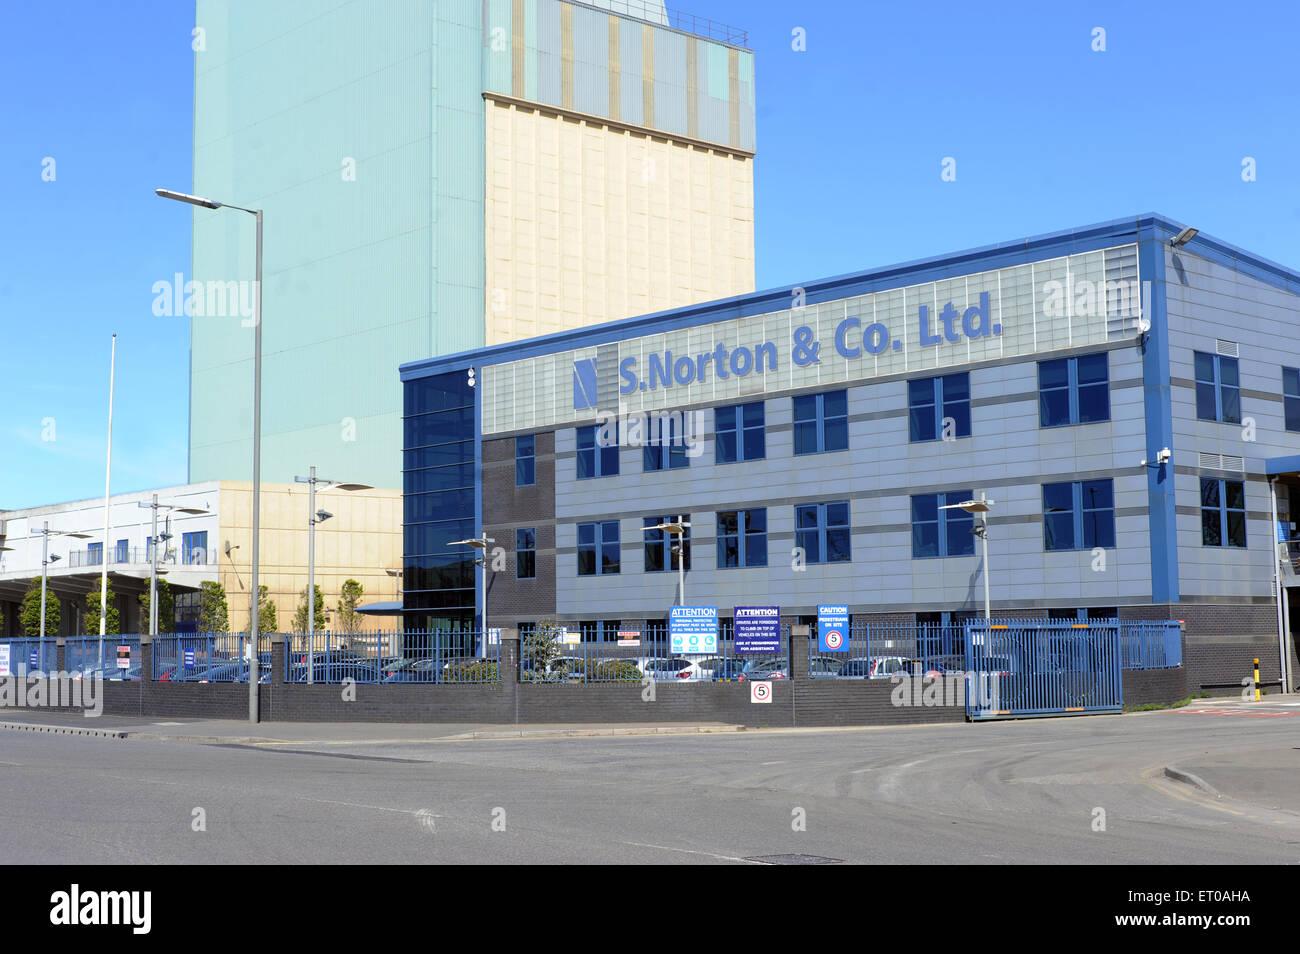 S.Norton & Co Ltd, Bankfield House, Bankfield Mil, Regent Road, Liverpool, L20 8RQ. Norton's are an established Stock Photo